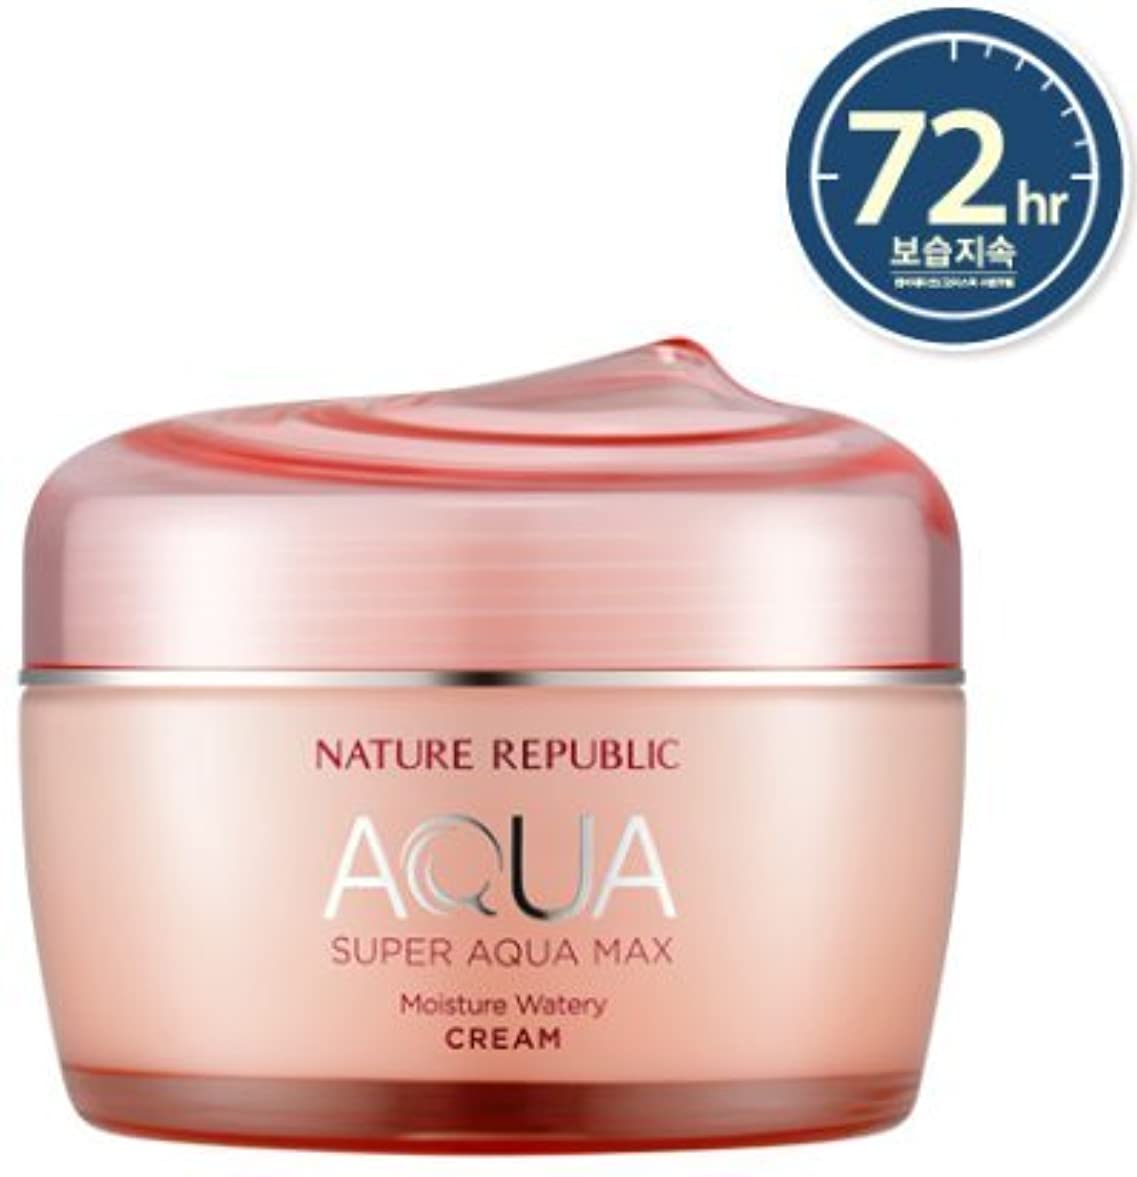 [NATURE REPUBLIC] スーパーアクアマックスモイスチャー水分クリーム / Super Aqua Max Moisture Watery Cream 80ml (乾燥肌用) [並行輸入品]